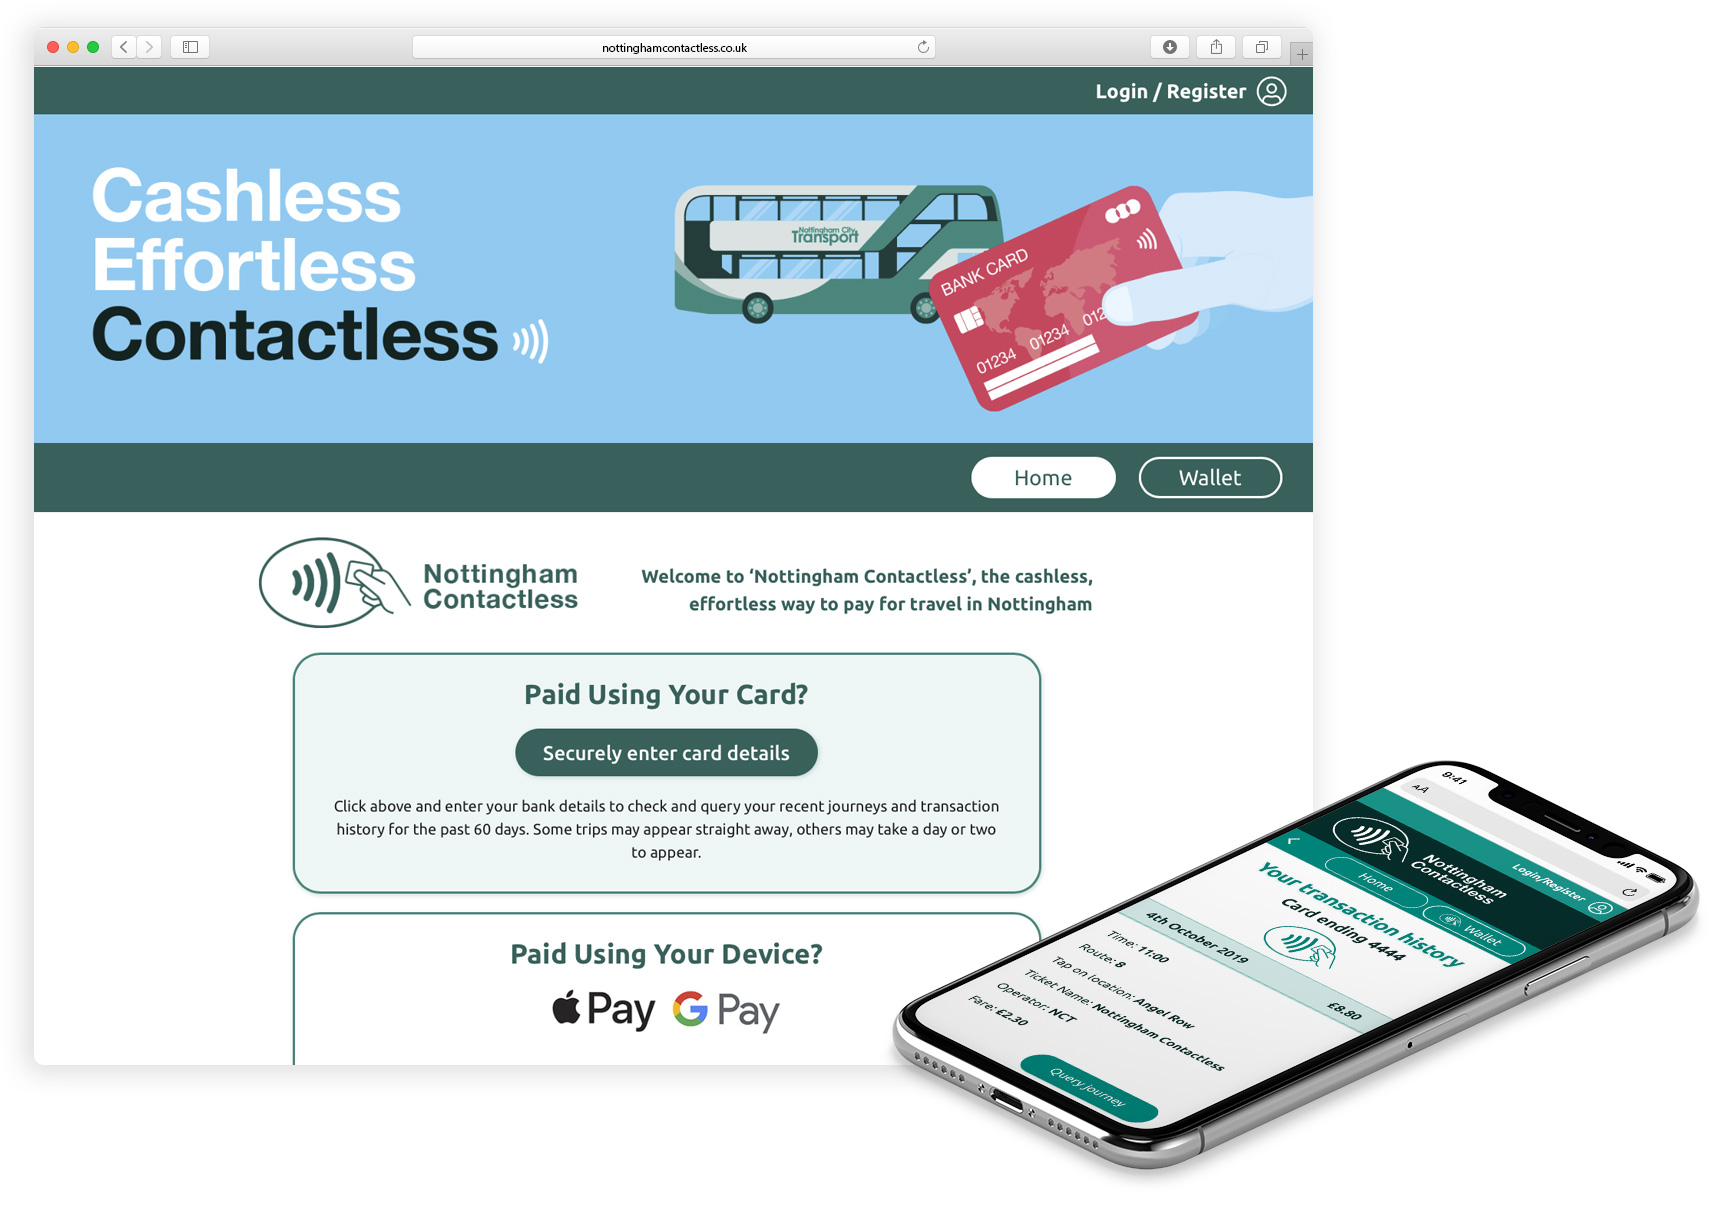 Nottingham Contactless Website image